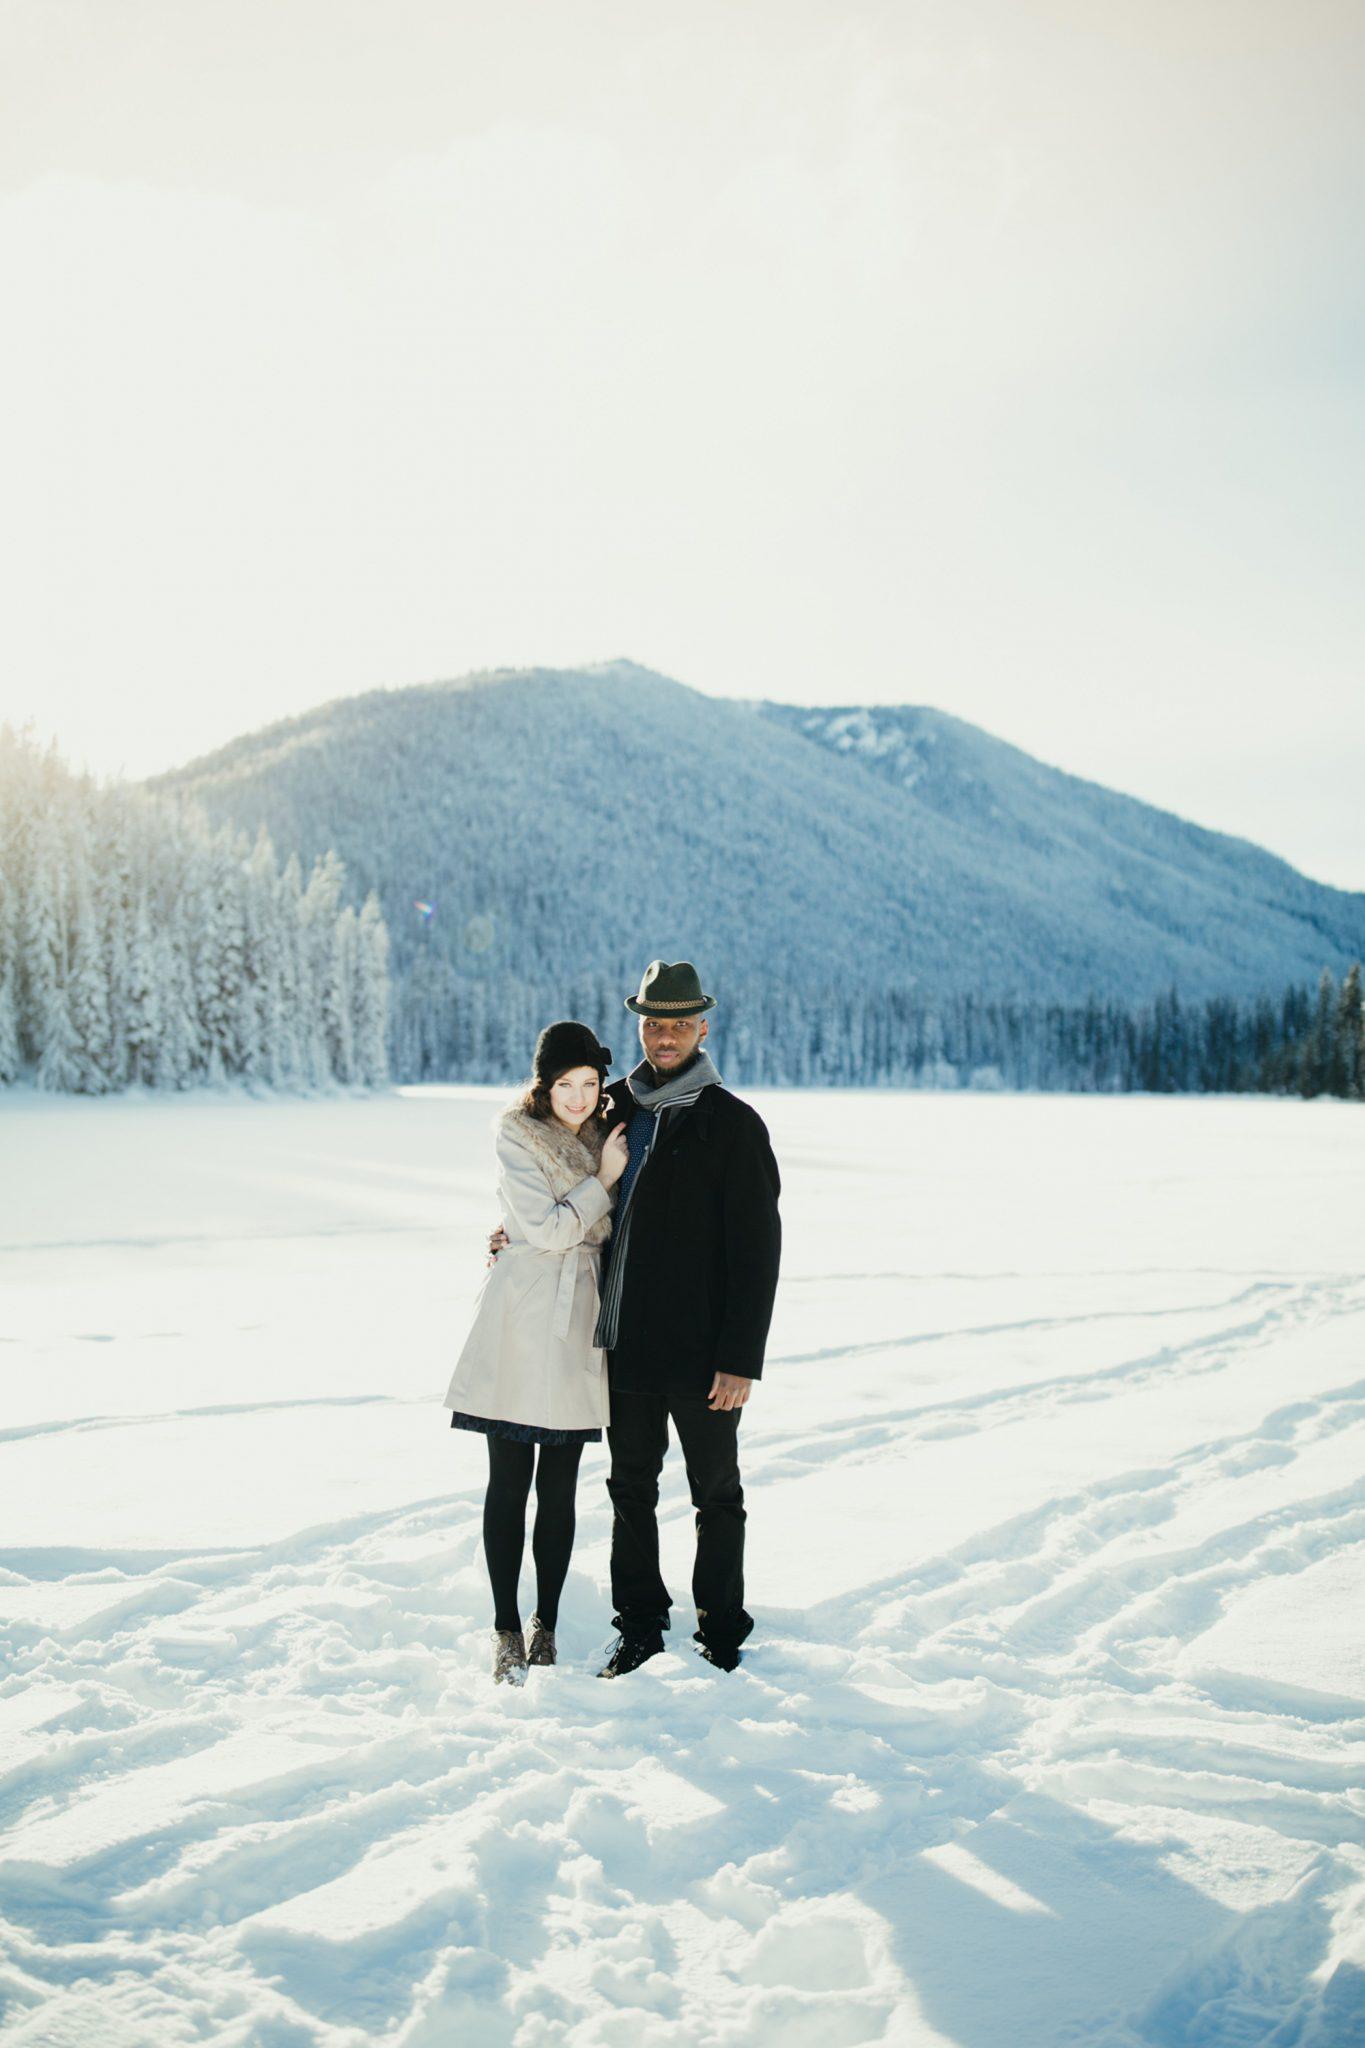 019-adventure-engagement-photographer